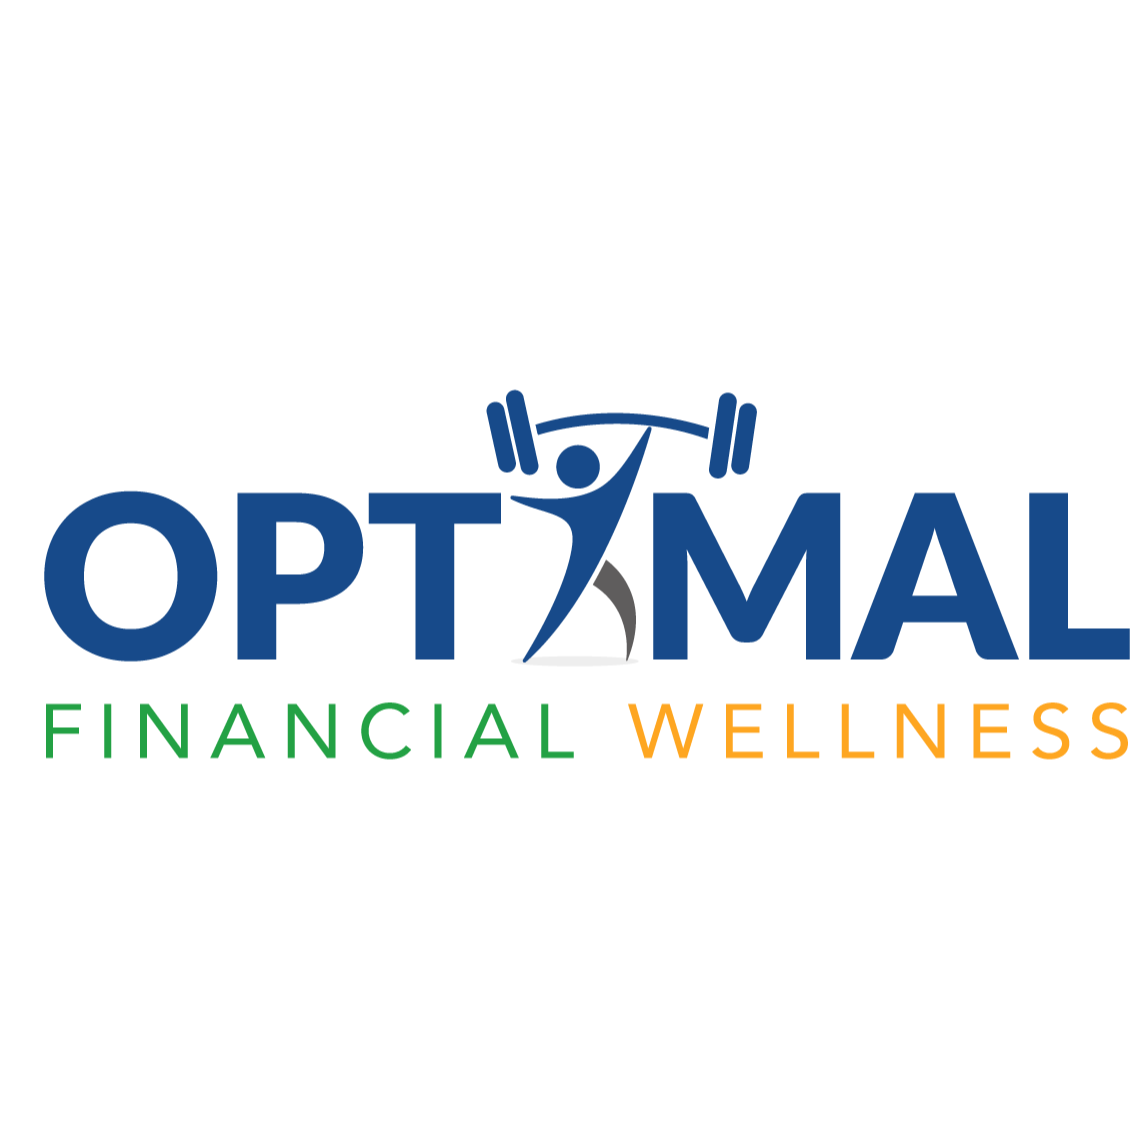 Optimal Financial Wellness